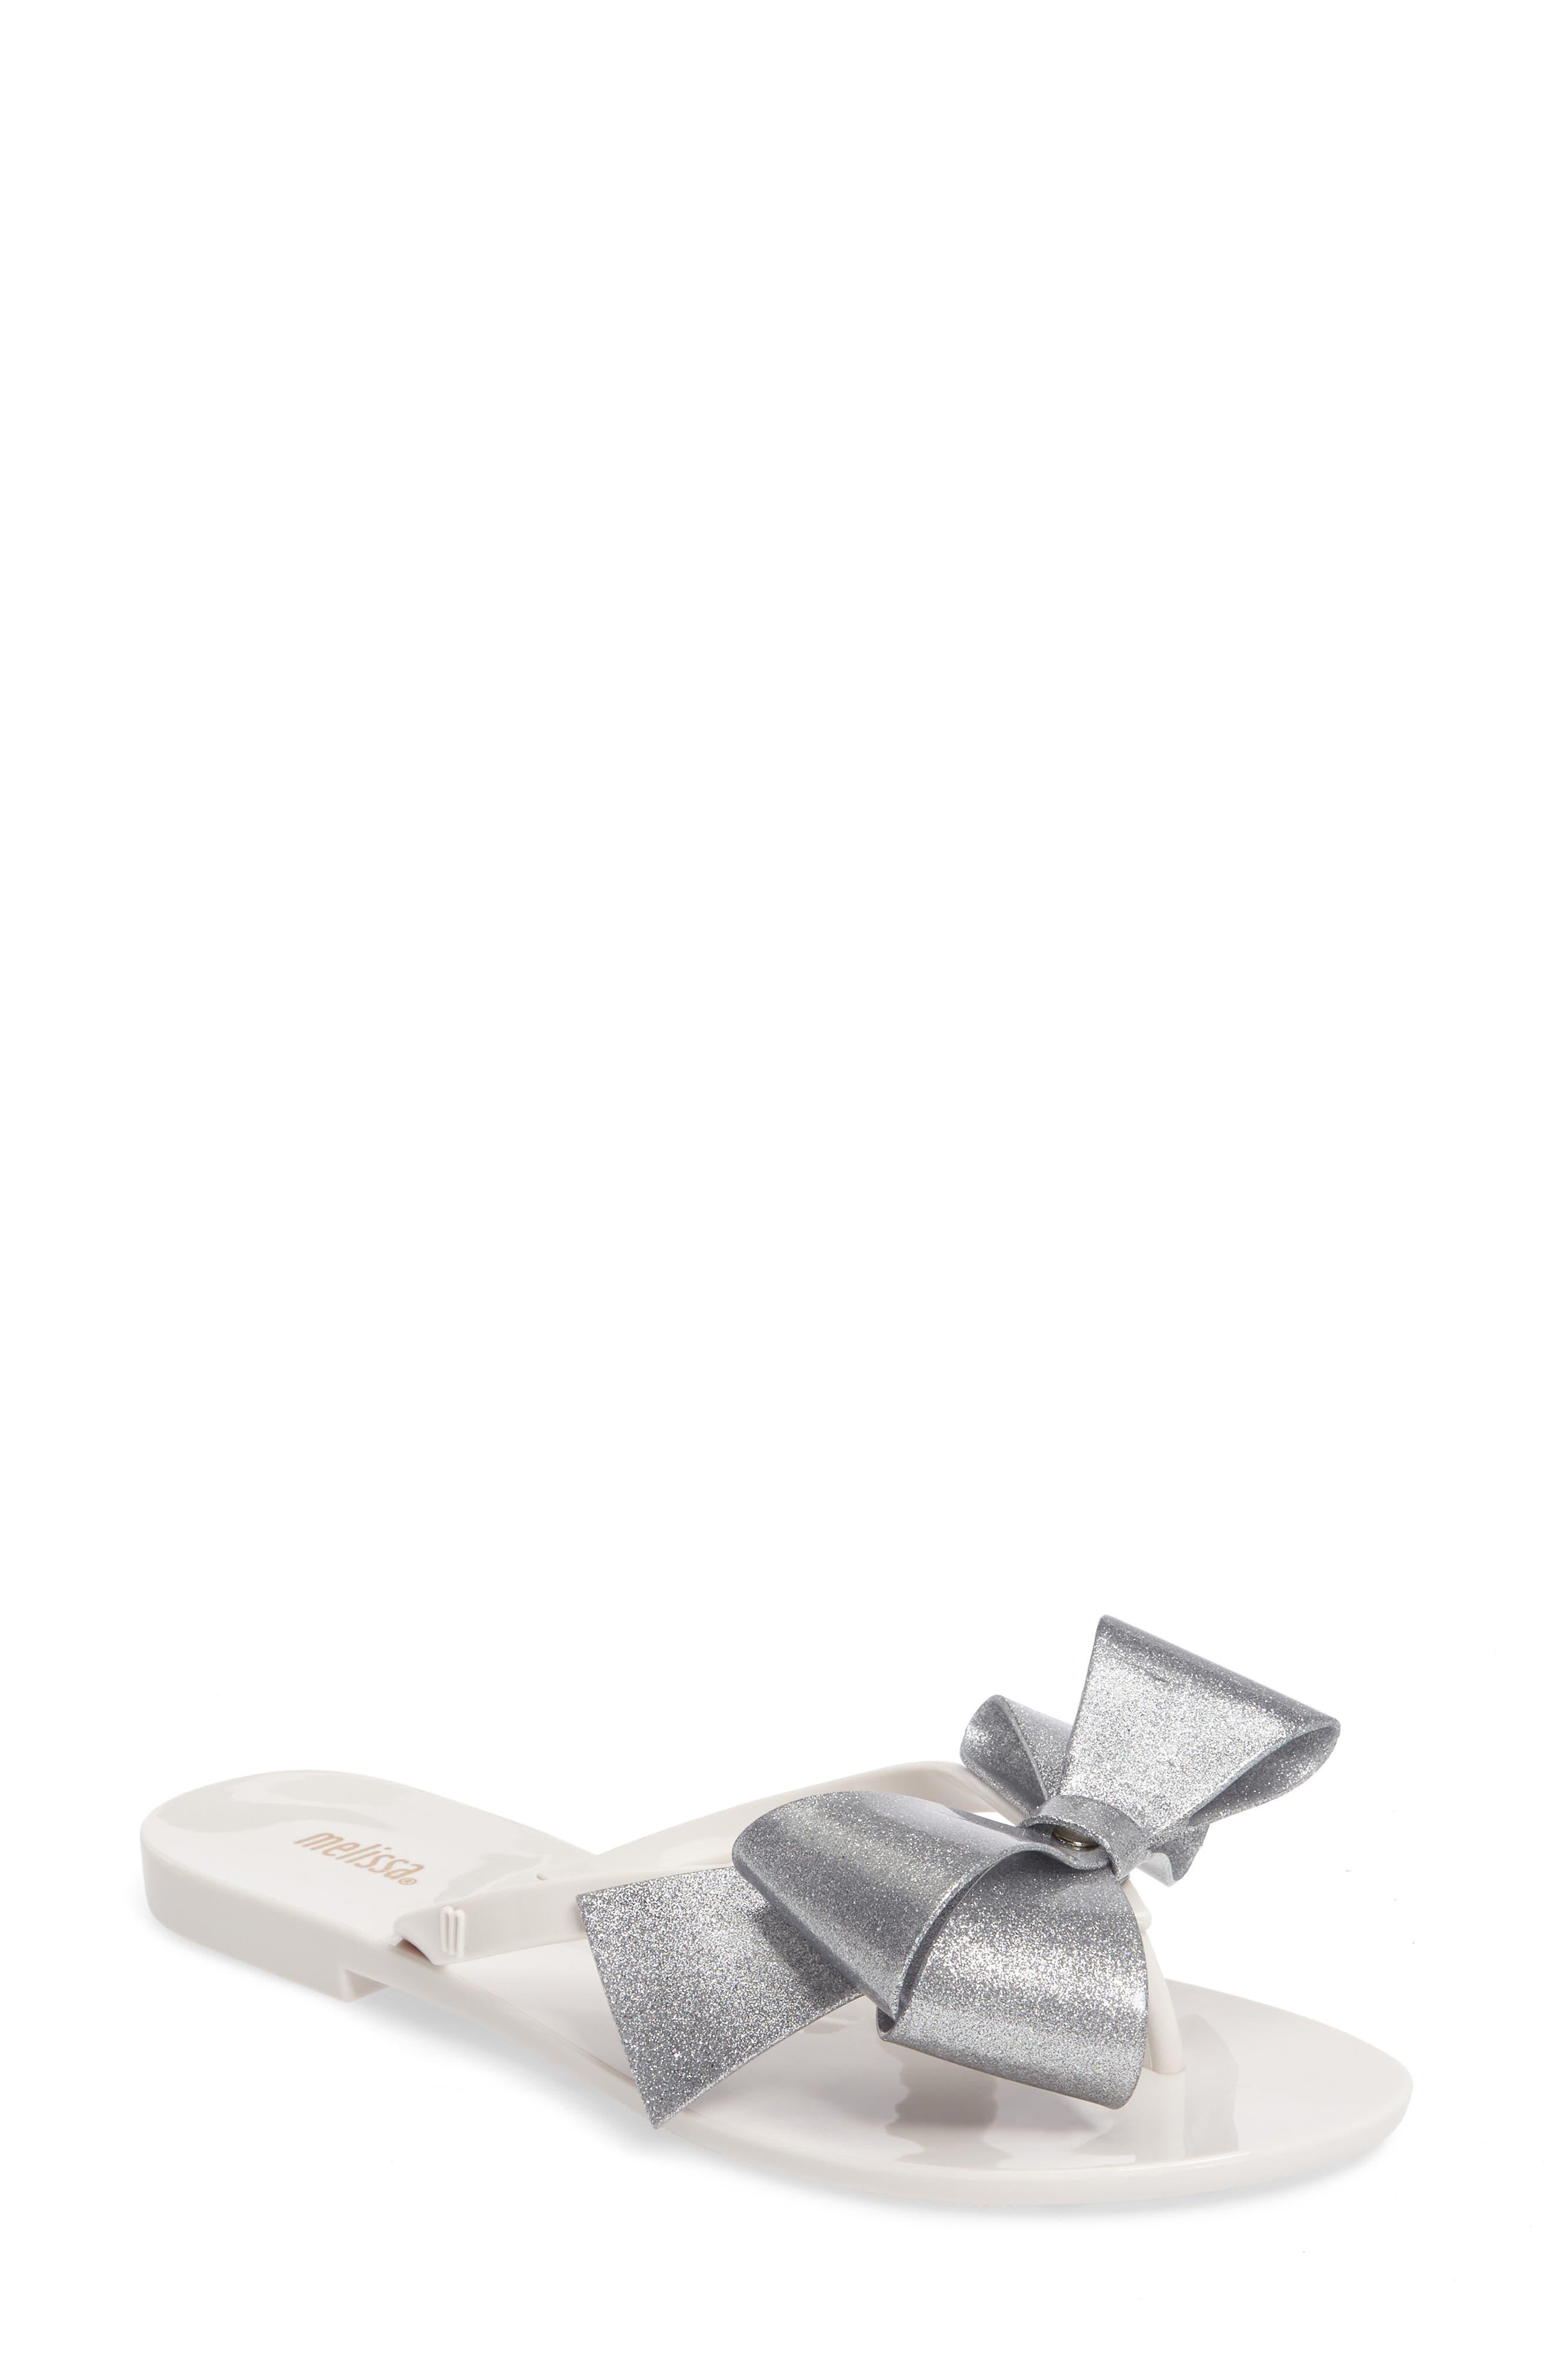 MELISSA Harmonic Bow III Flip Flop